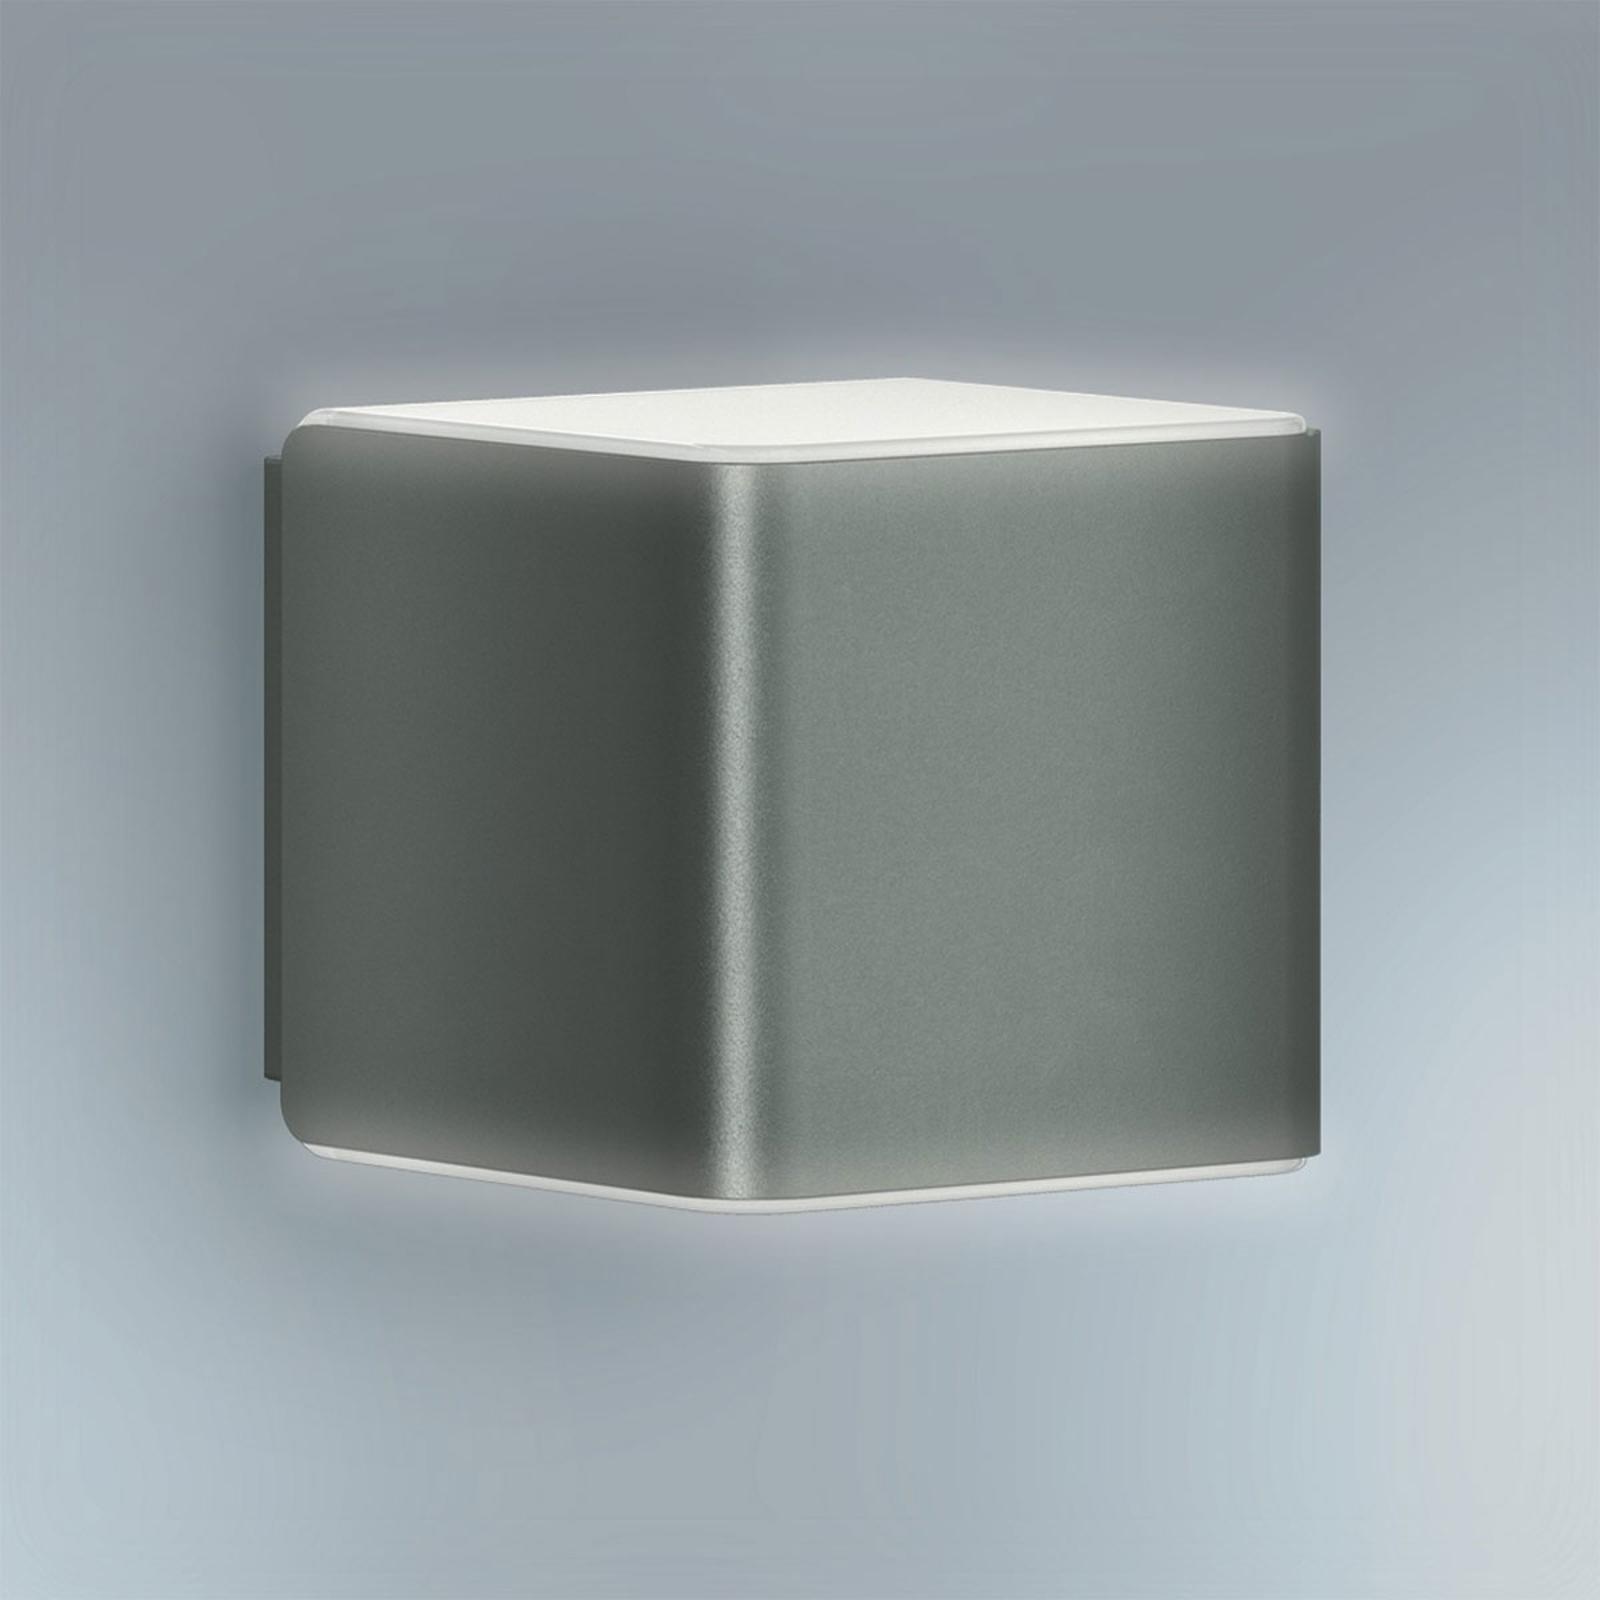 STEINEL L 840 LED iHF applique, anthracite